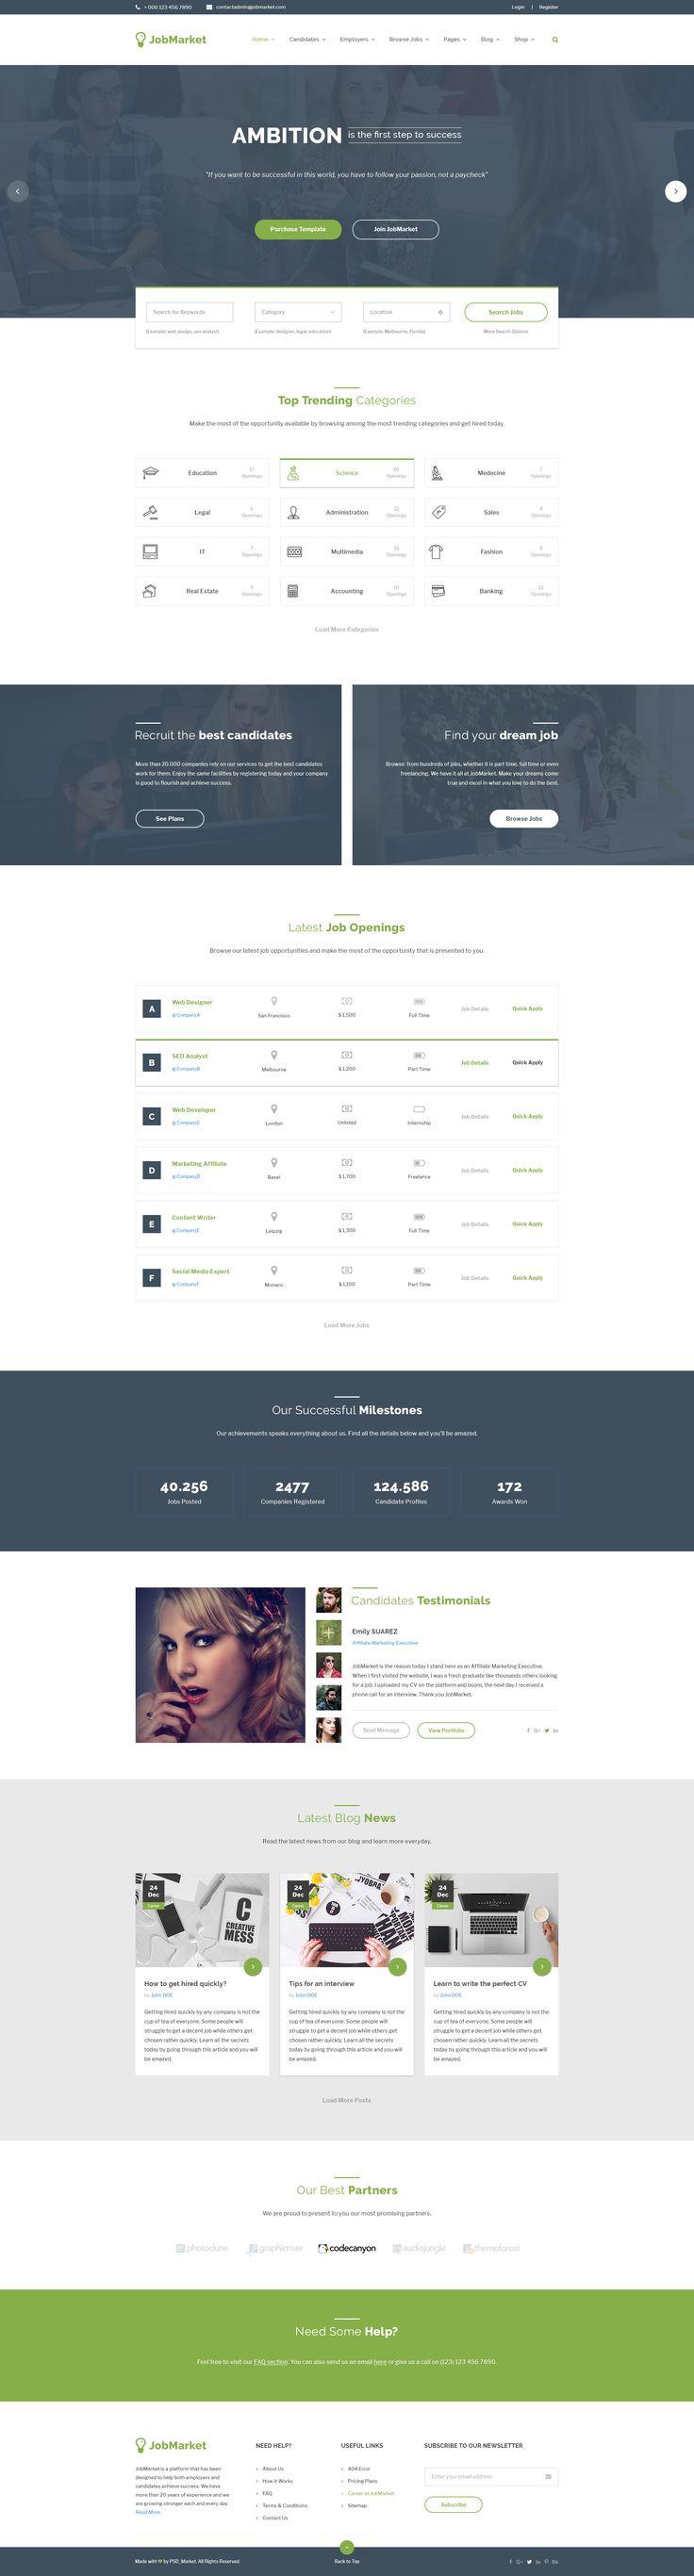 JobMarket - Job Portal PSD Template (Multipurpose) by PSD_Market | ThemeForest